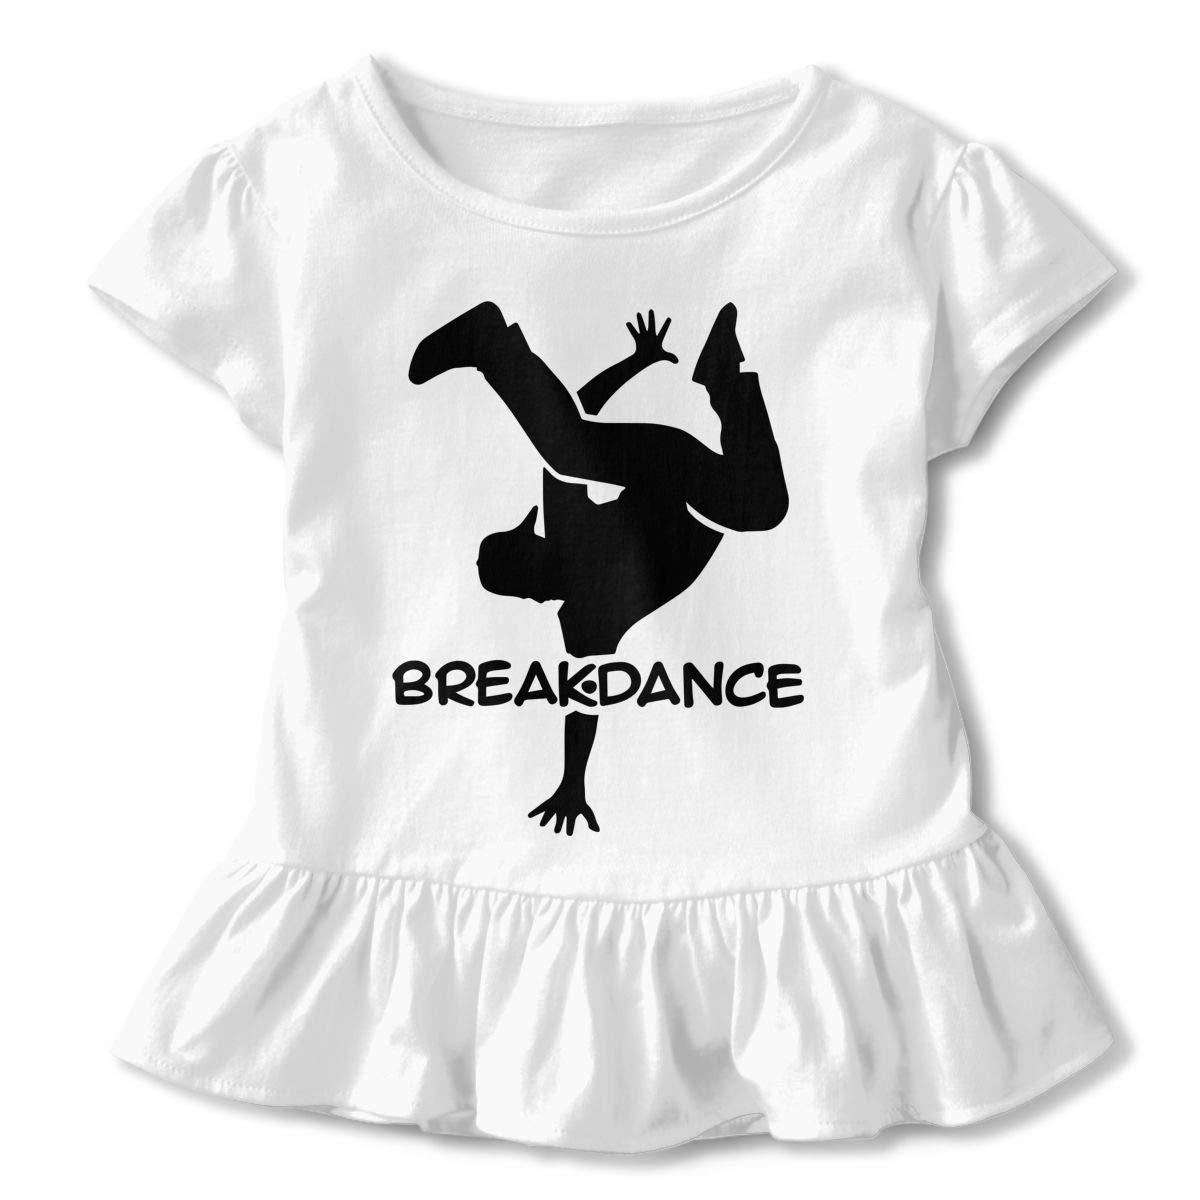 Breakdance Silhouette Kids Girls Short Sleeve Shirts Ruffles Shirt T-Shirt for 2-6T